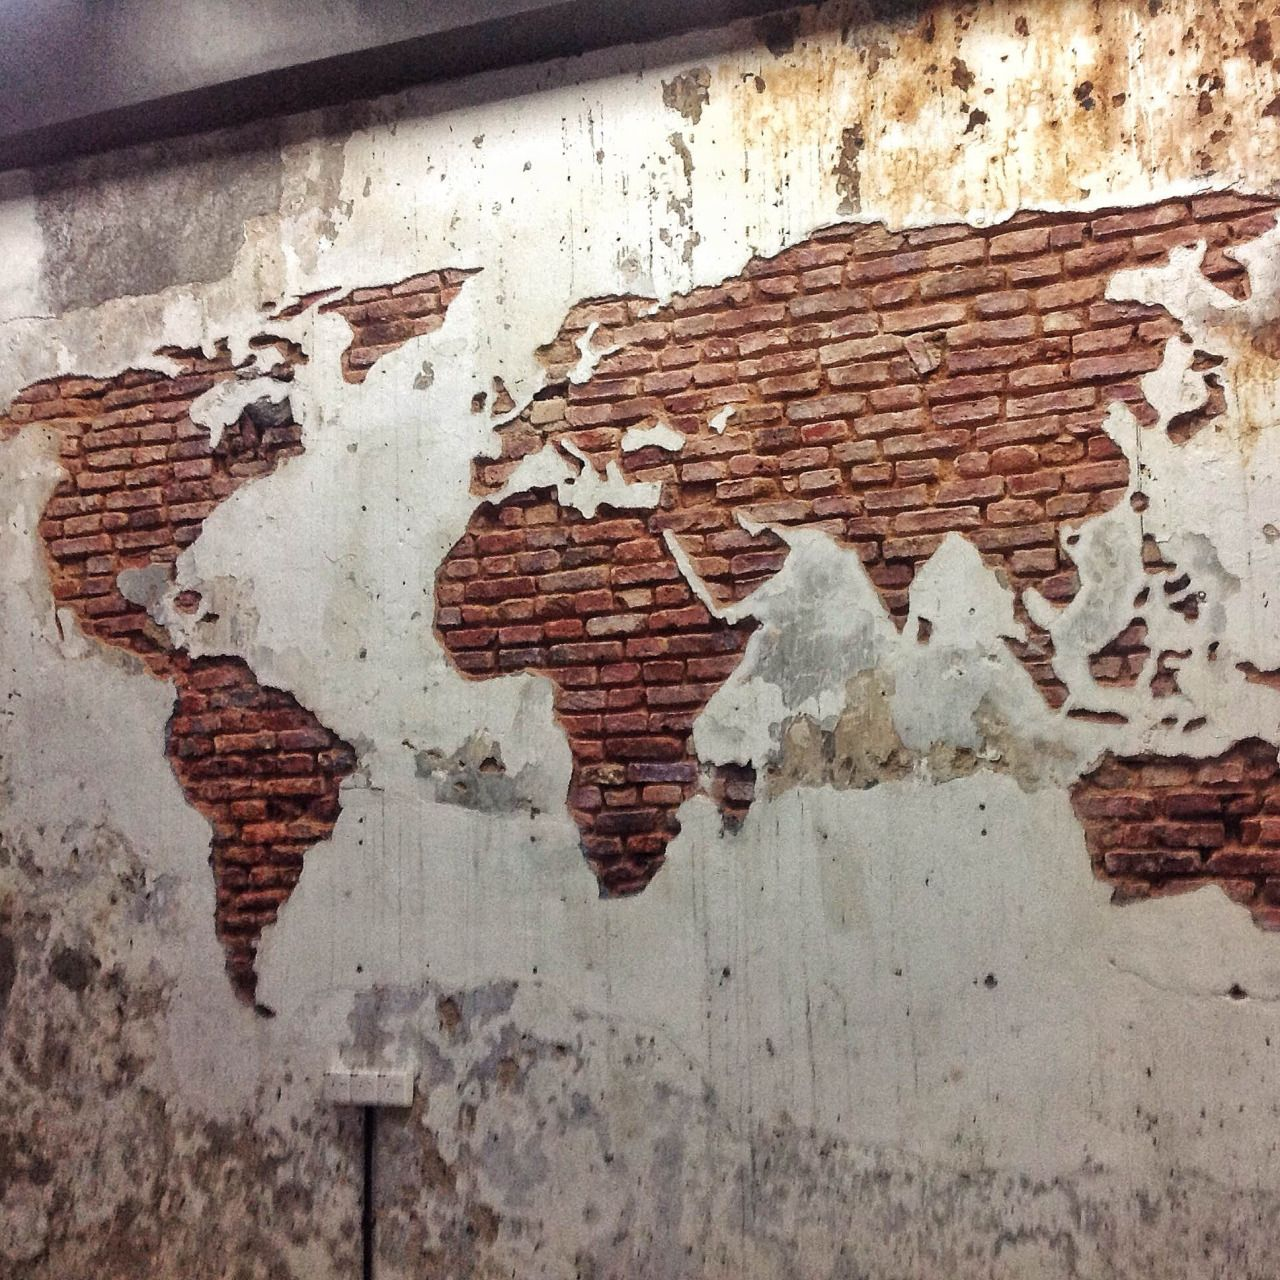 World Map Wall Decor Malaysia. World map mural in Malaysia  Penang by Jurgis Tarabilda and Gintautas Grusas greenlikebathwater Nostalgia Dan Creative